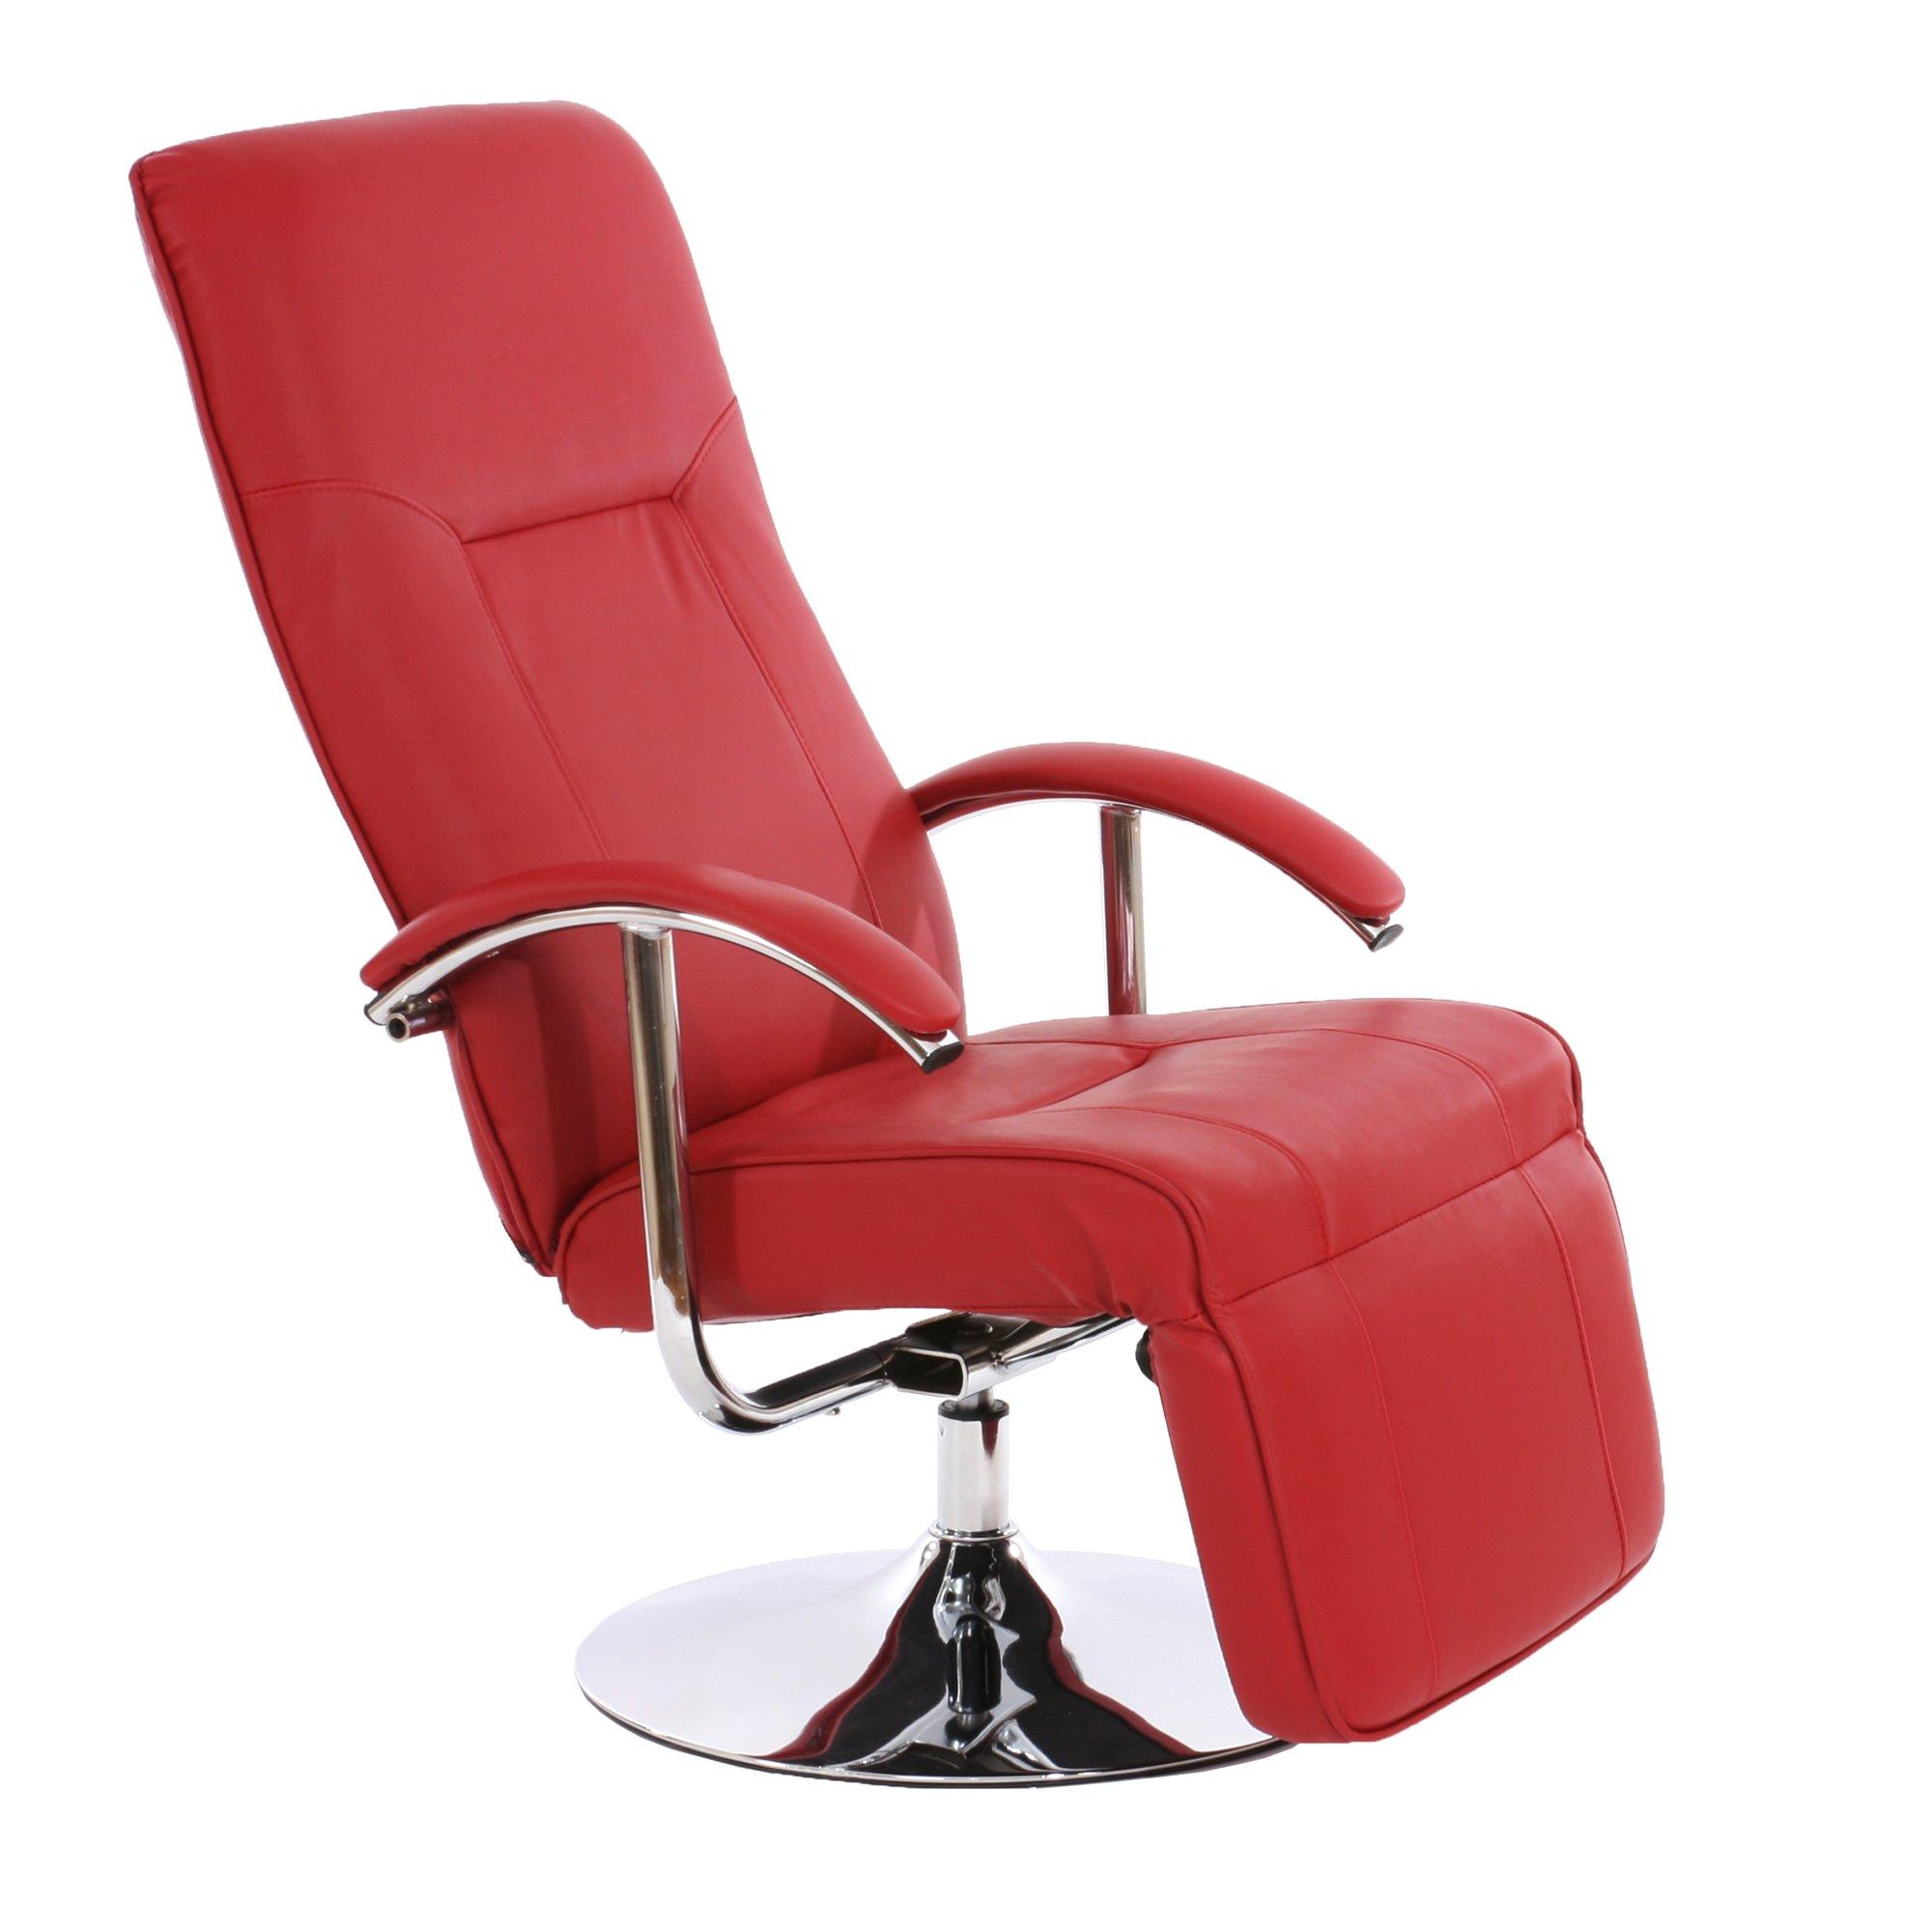 Sill n relax reclinable modelo apia ii en piel color roja for Sillones reclinables precios